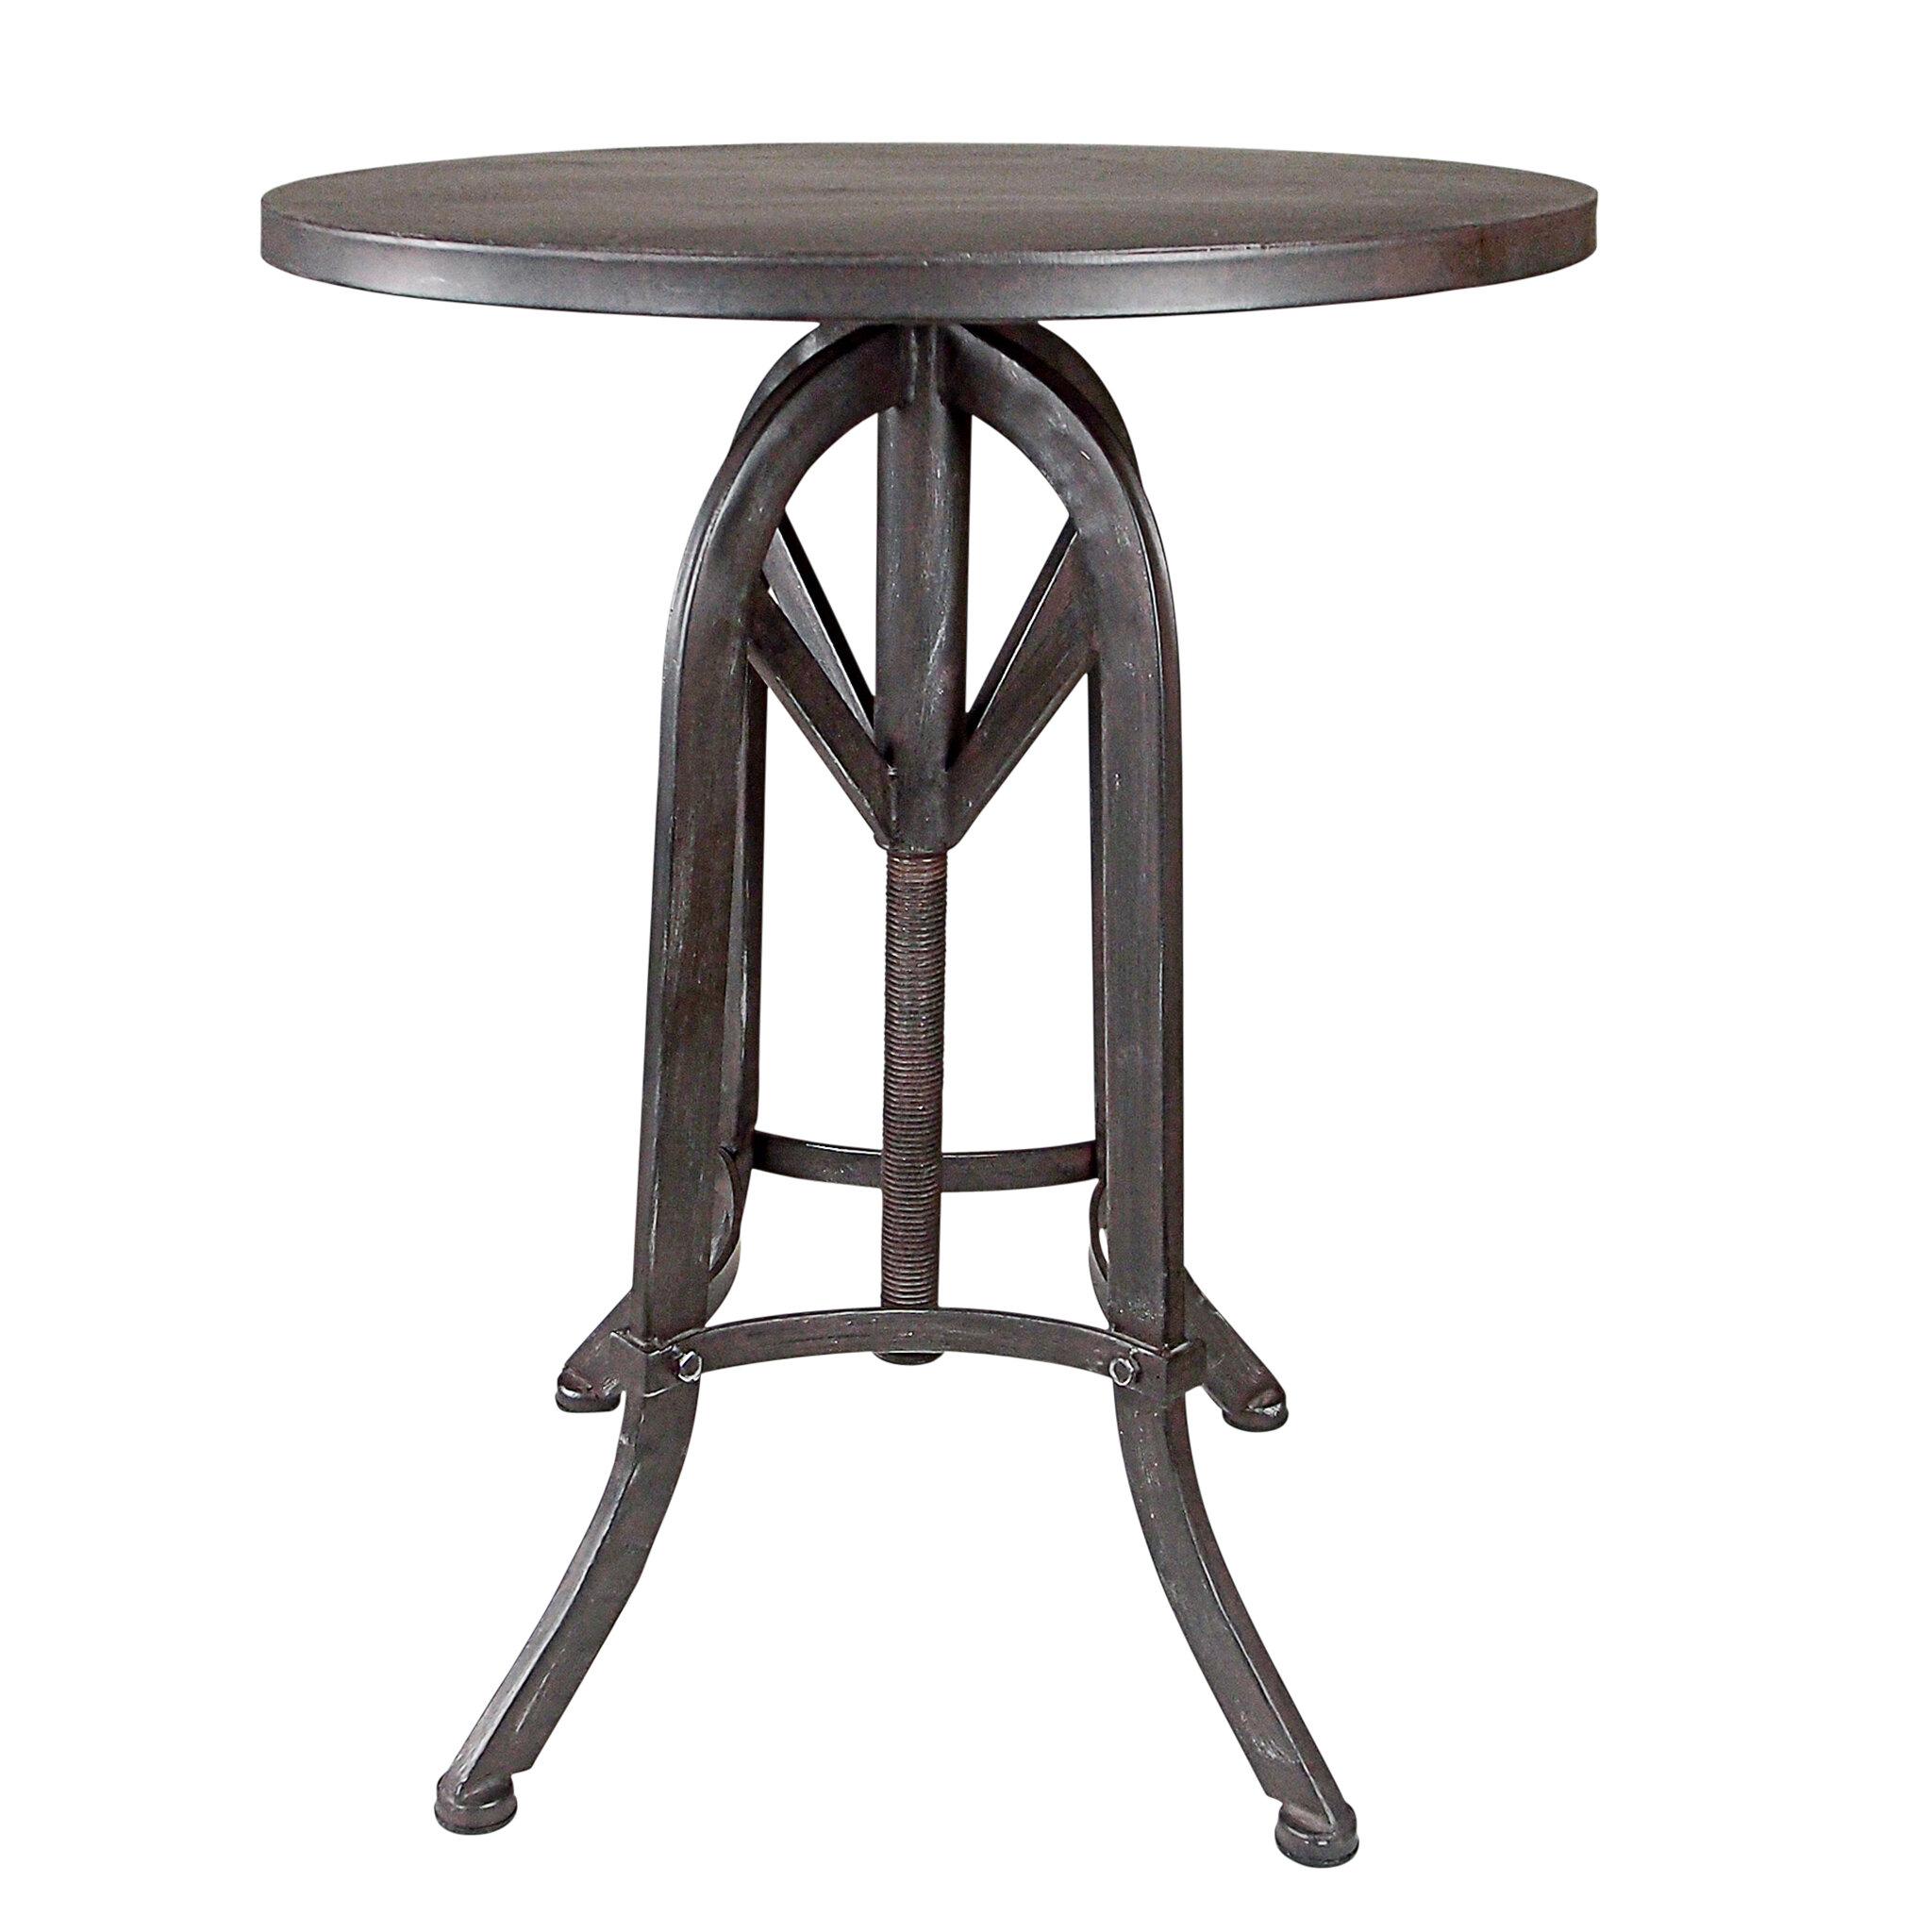 Etonnant Design Toscano Industrial Revolution End Table U0026 Reviews | Wayfair